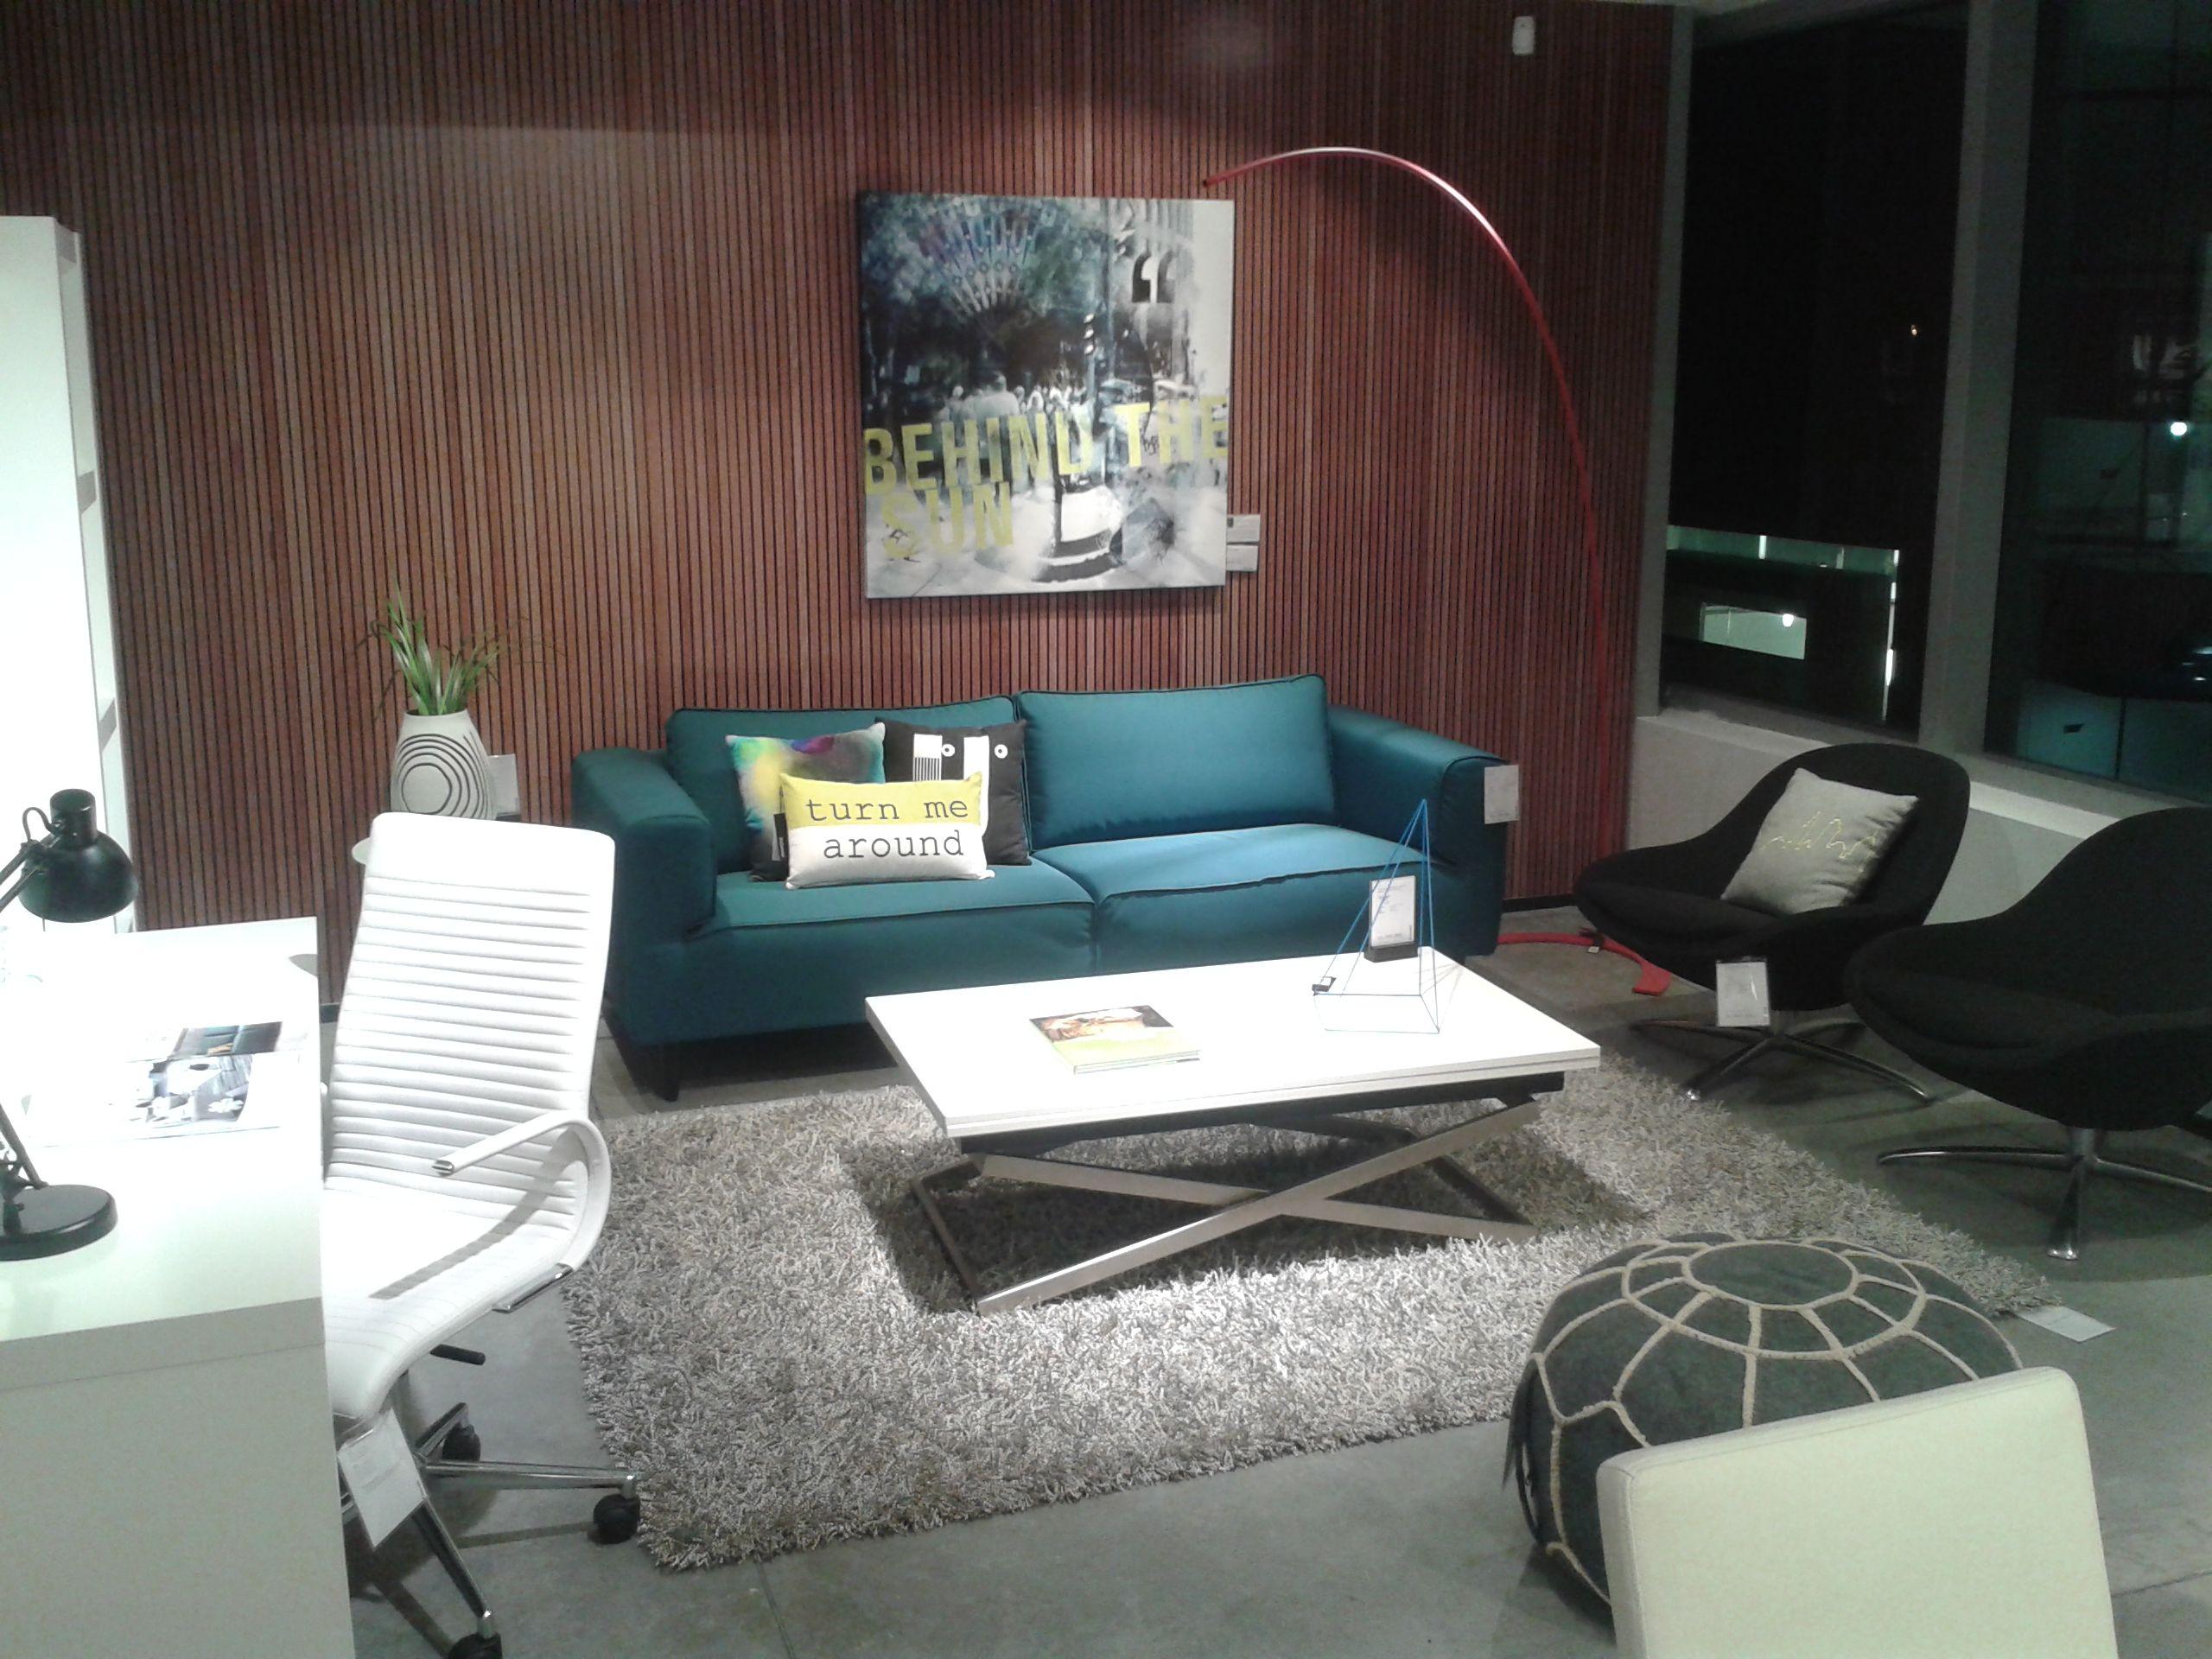 BoConcept Arco sofa with Rubi coffee table and Veneto chairs